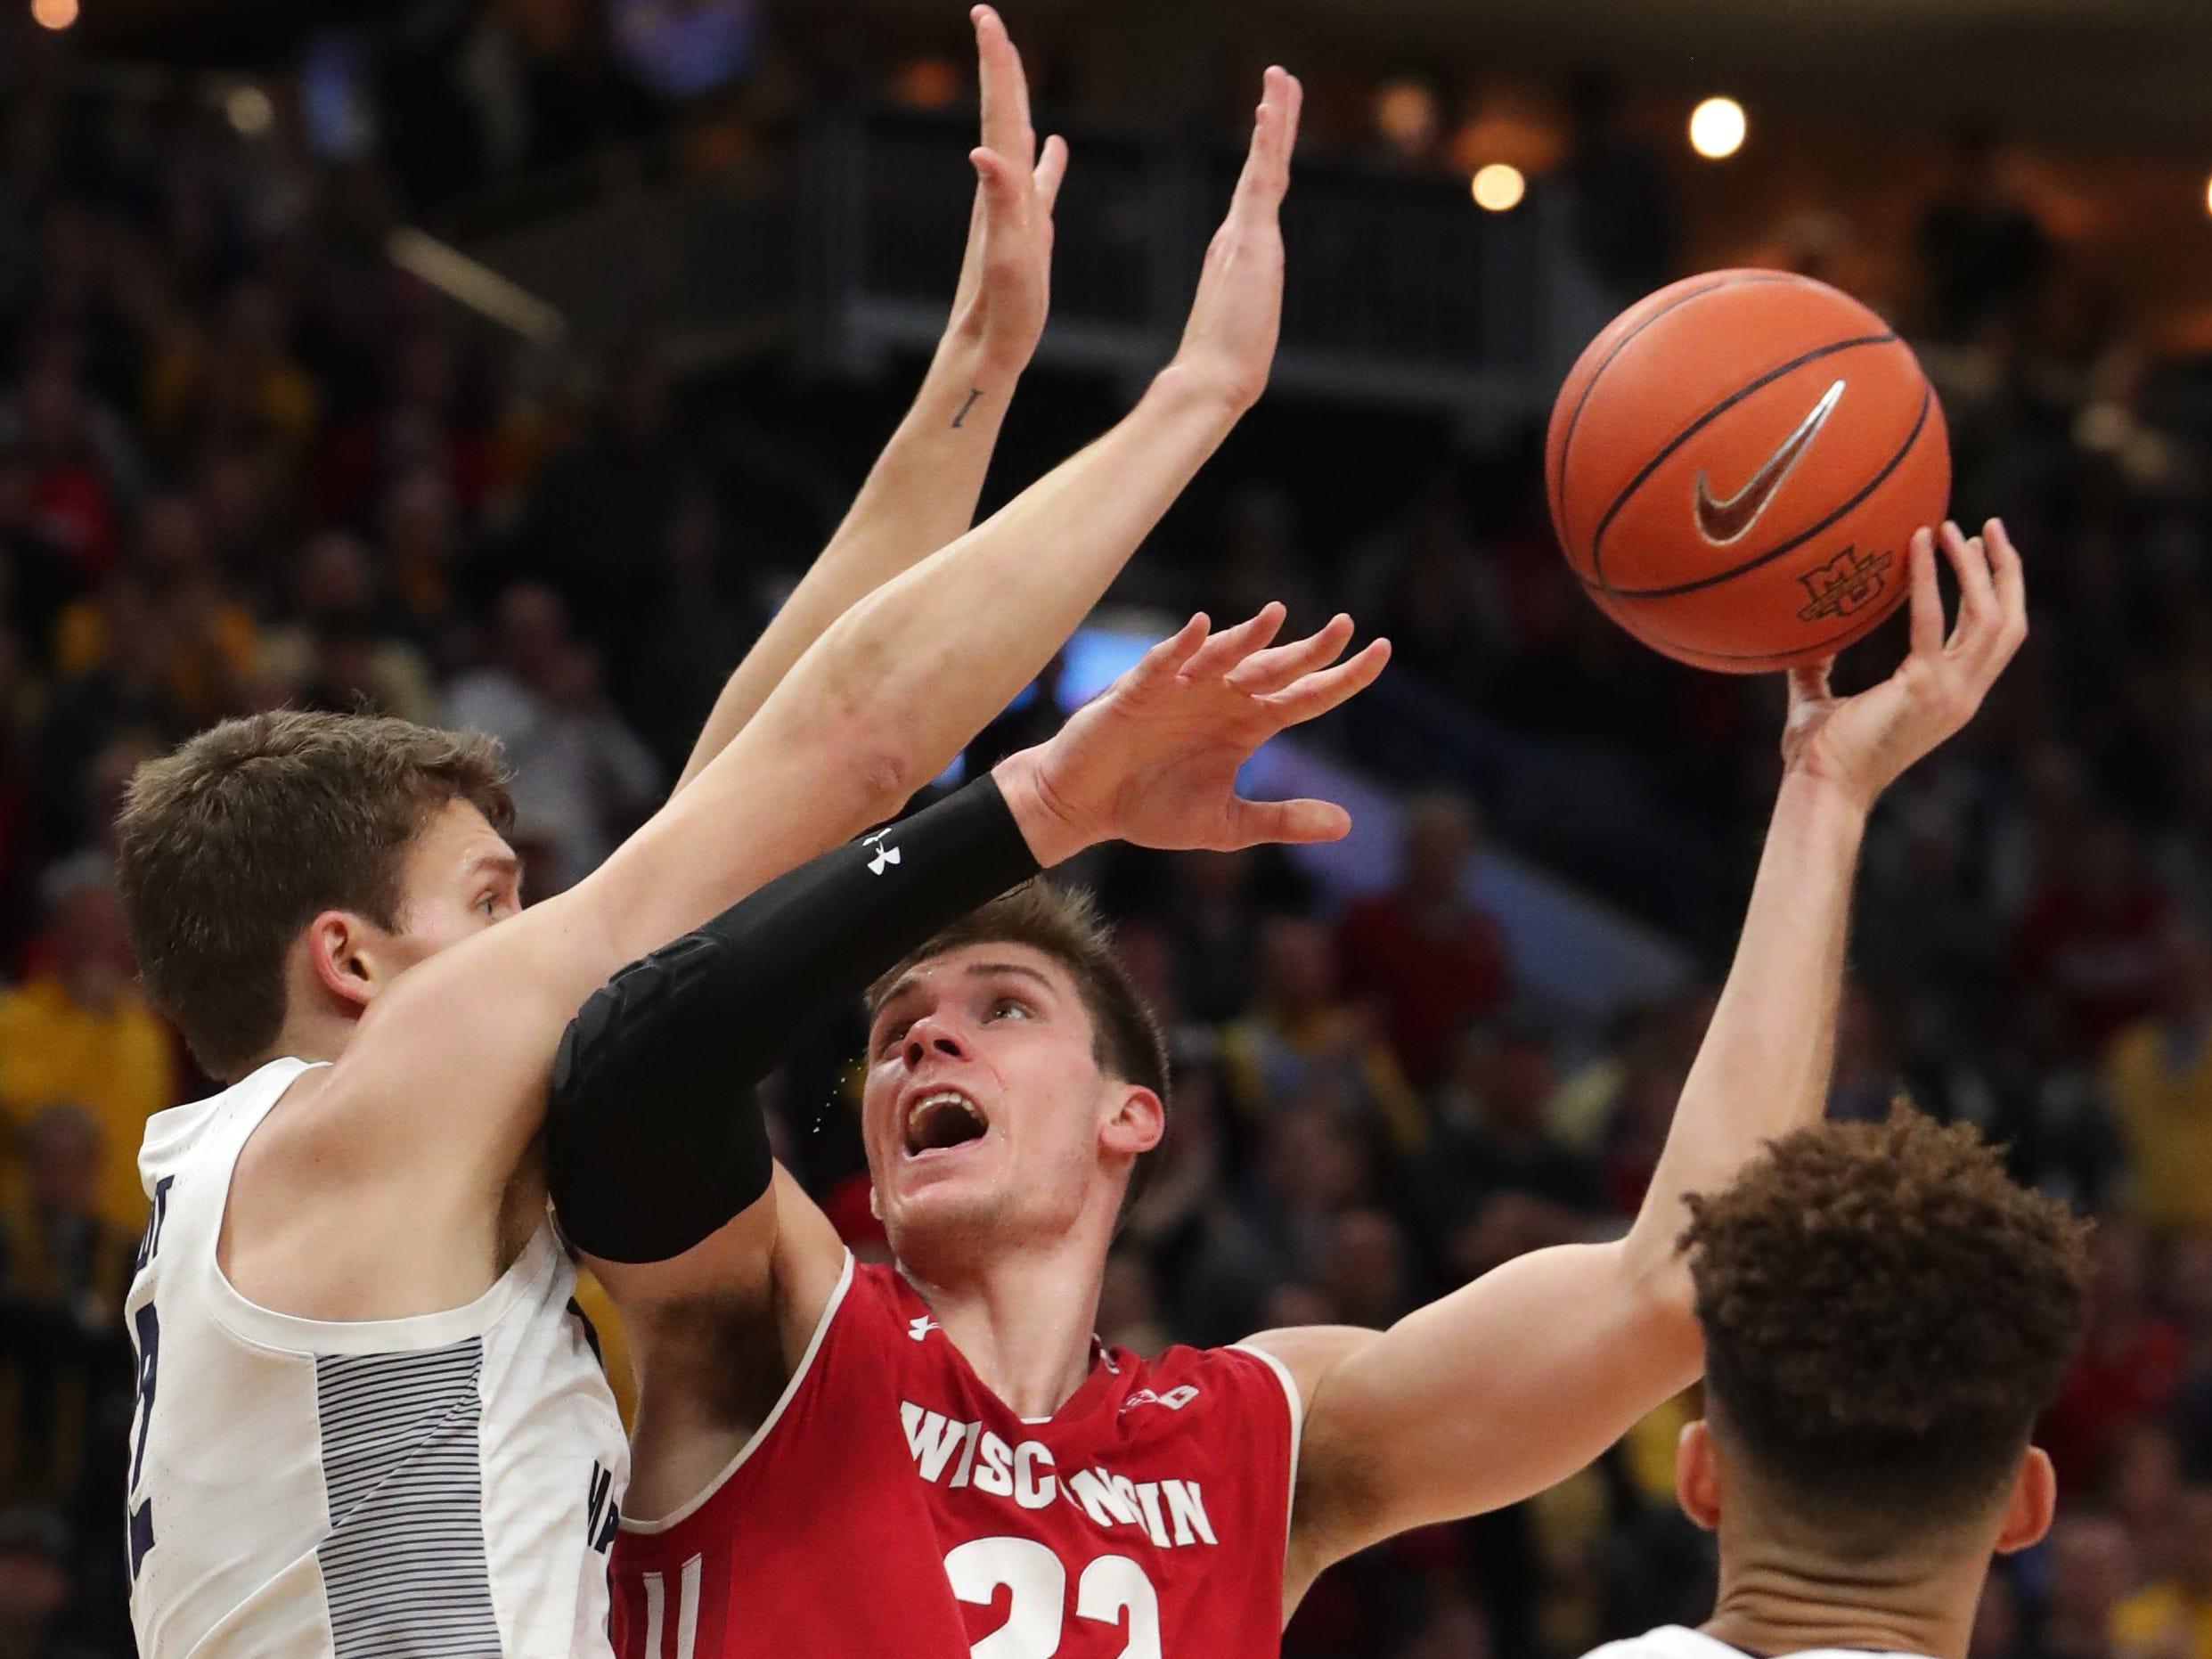 Wisconsin forward Ethan Happ (22) is tested by Marquette center Matt Heldt.